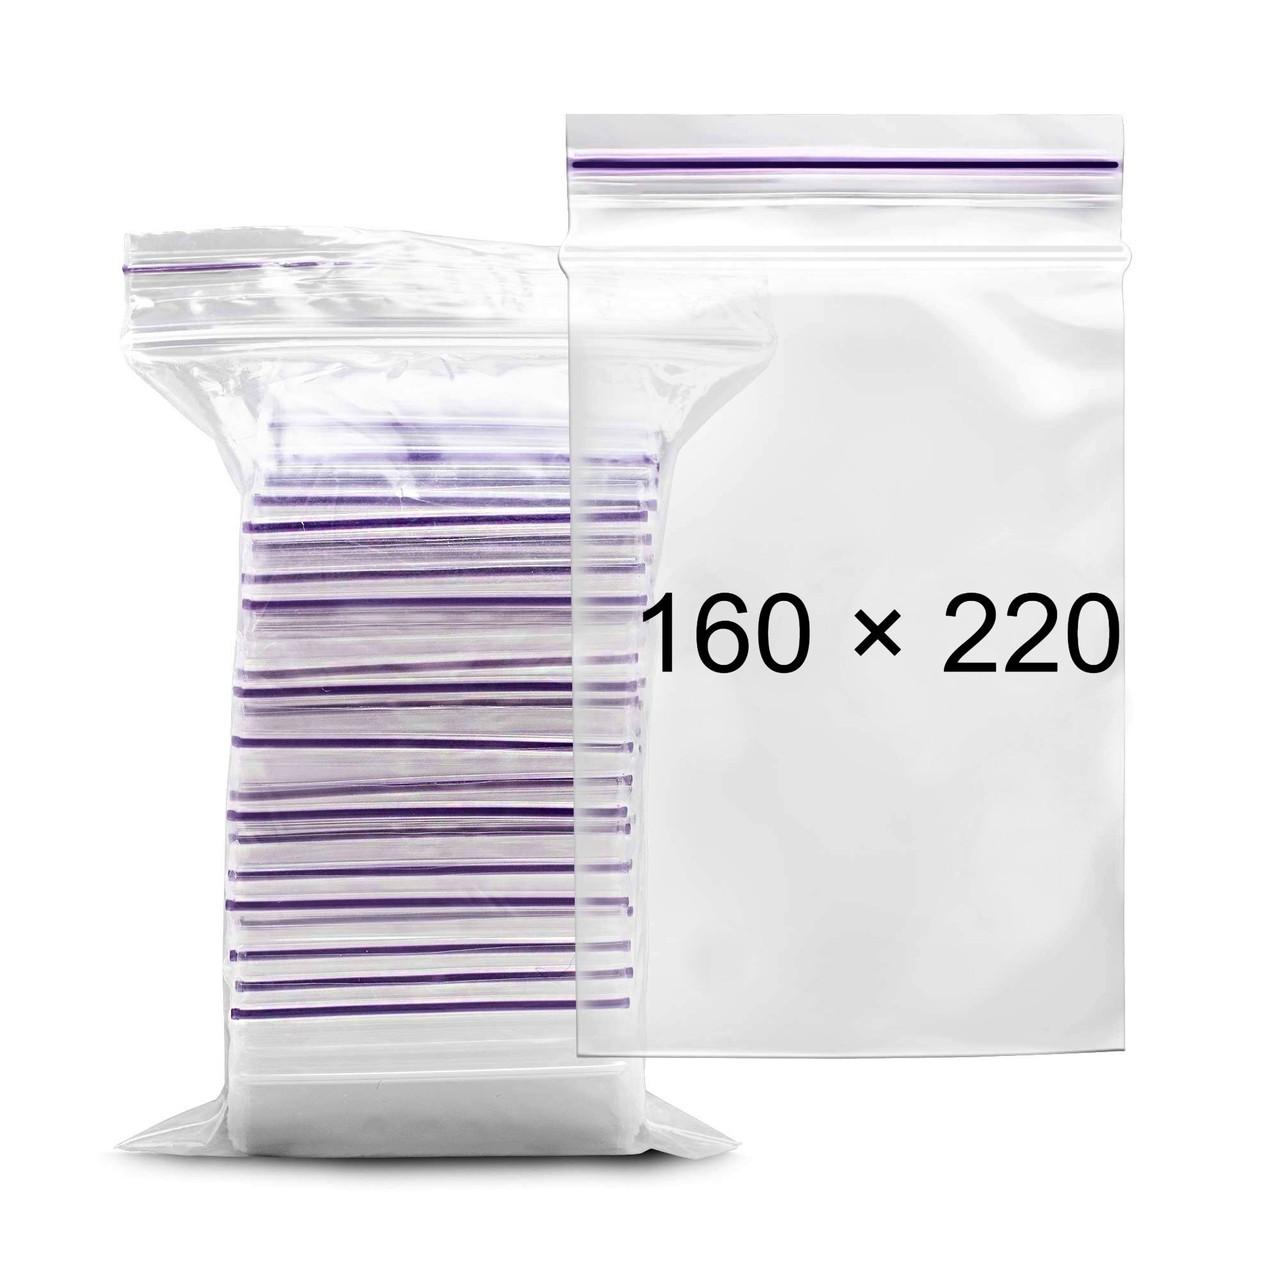 Пакеты с замком Zip-Lock - 160 × 220